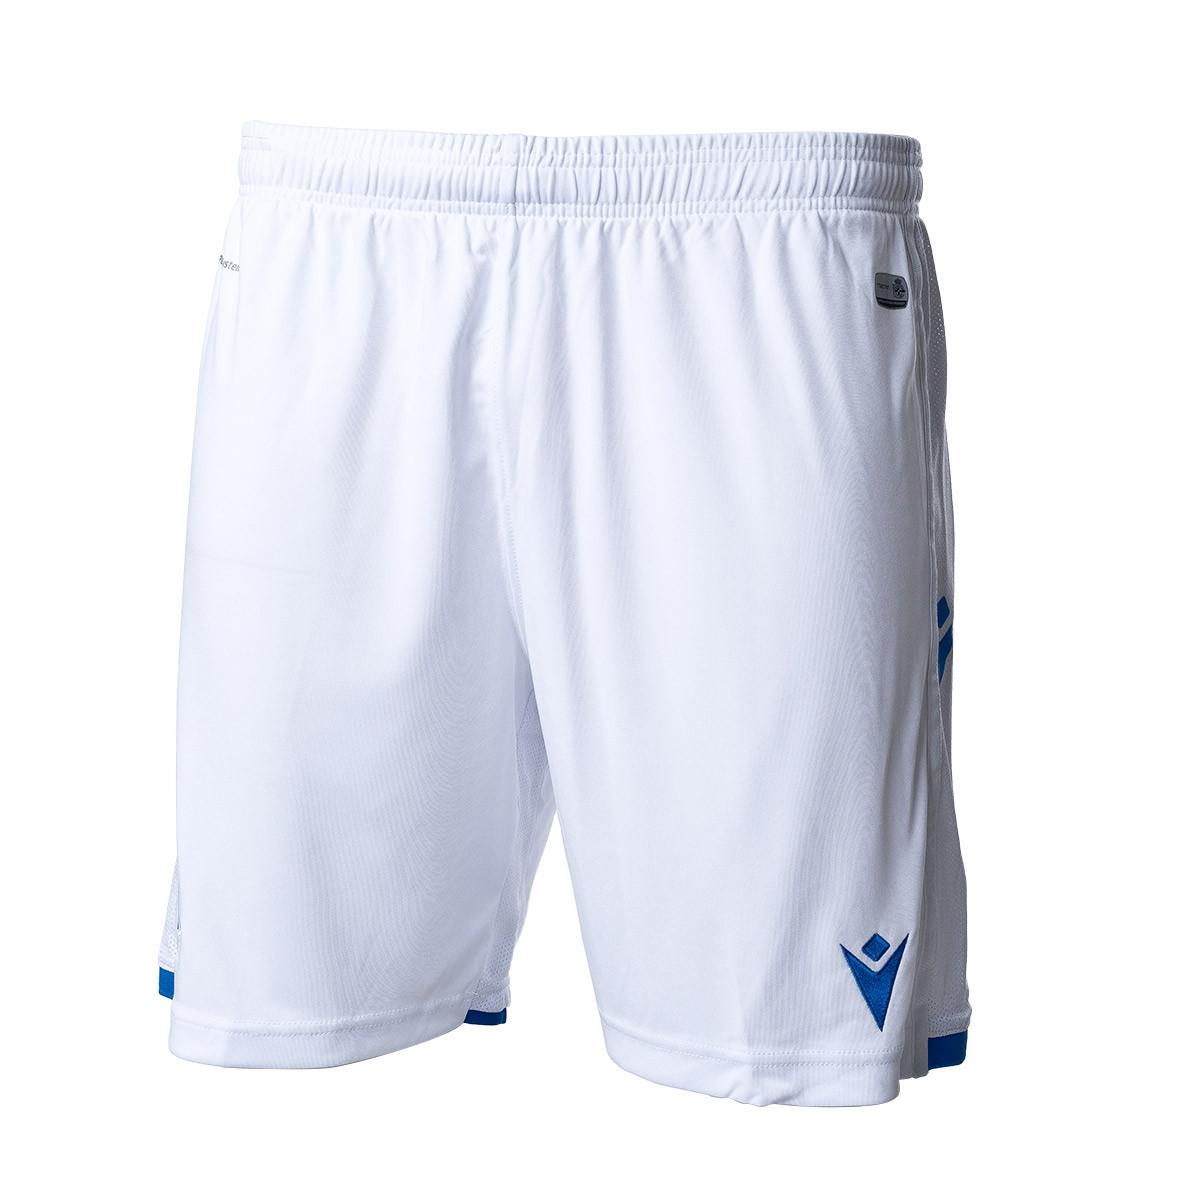 Pantal/ón Corto Macron RC Deportivo La Coru/ña Segunda Equipaci/ón 2019-2020 Ni/ño Blue